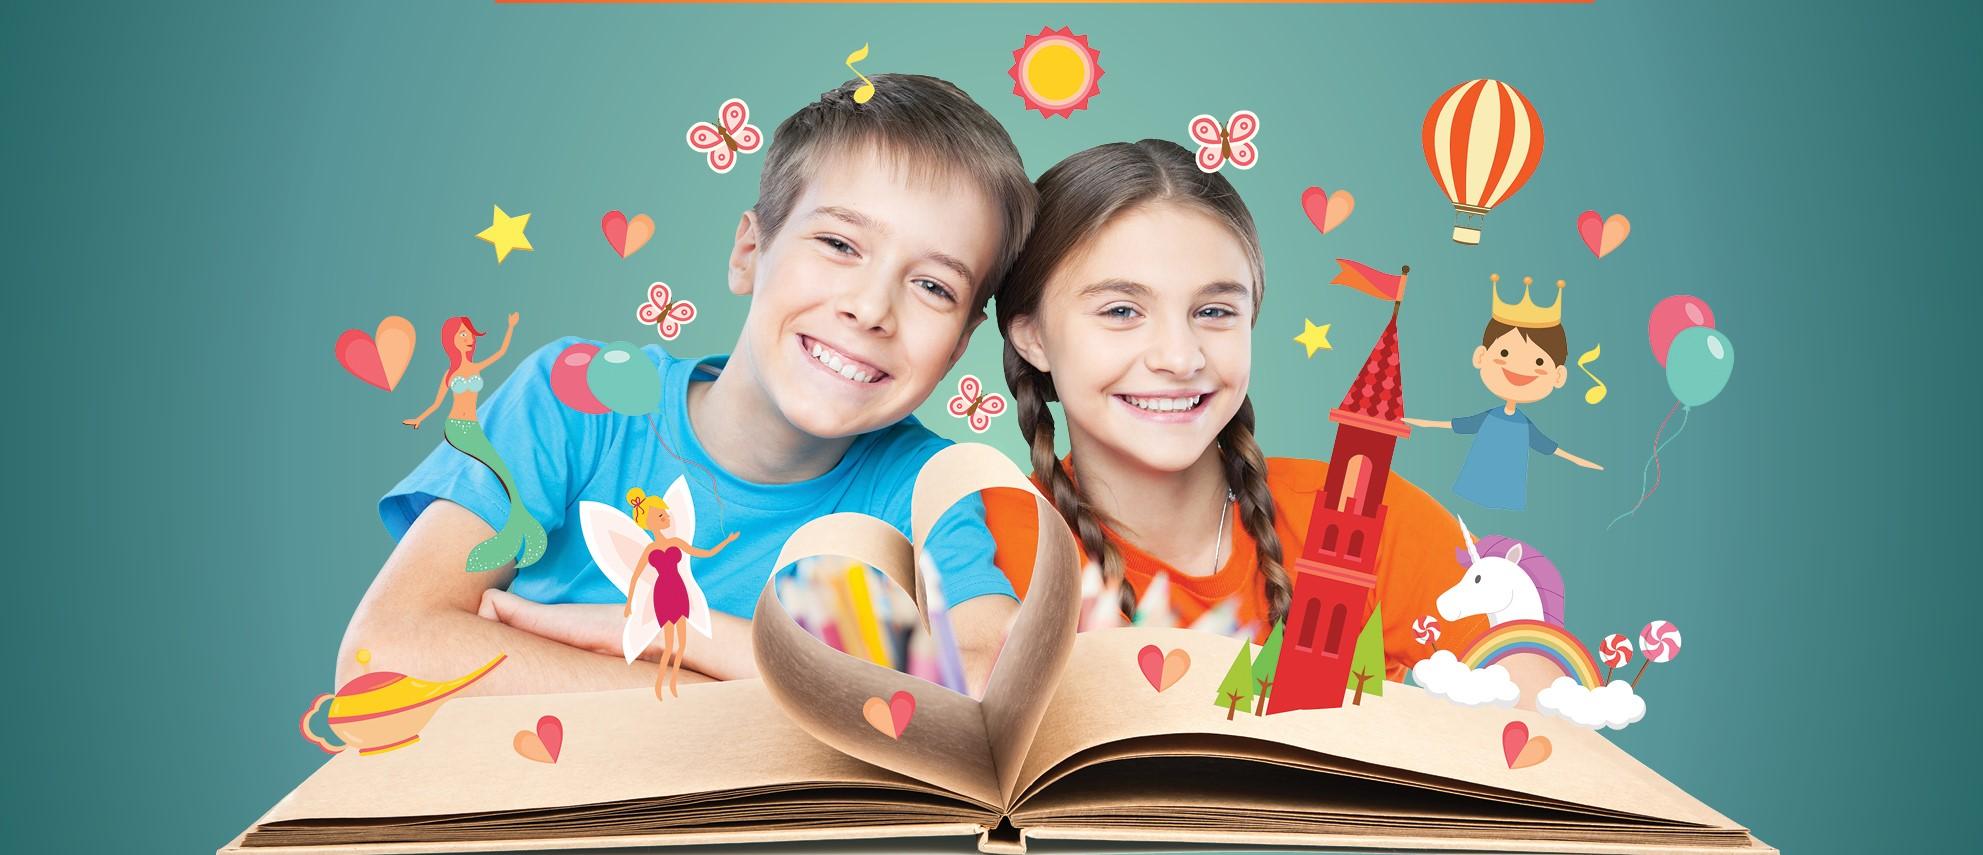 Tepe Nautilus Geleneksel Mini Kitap Şenliği